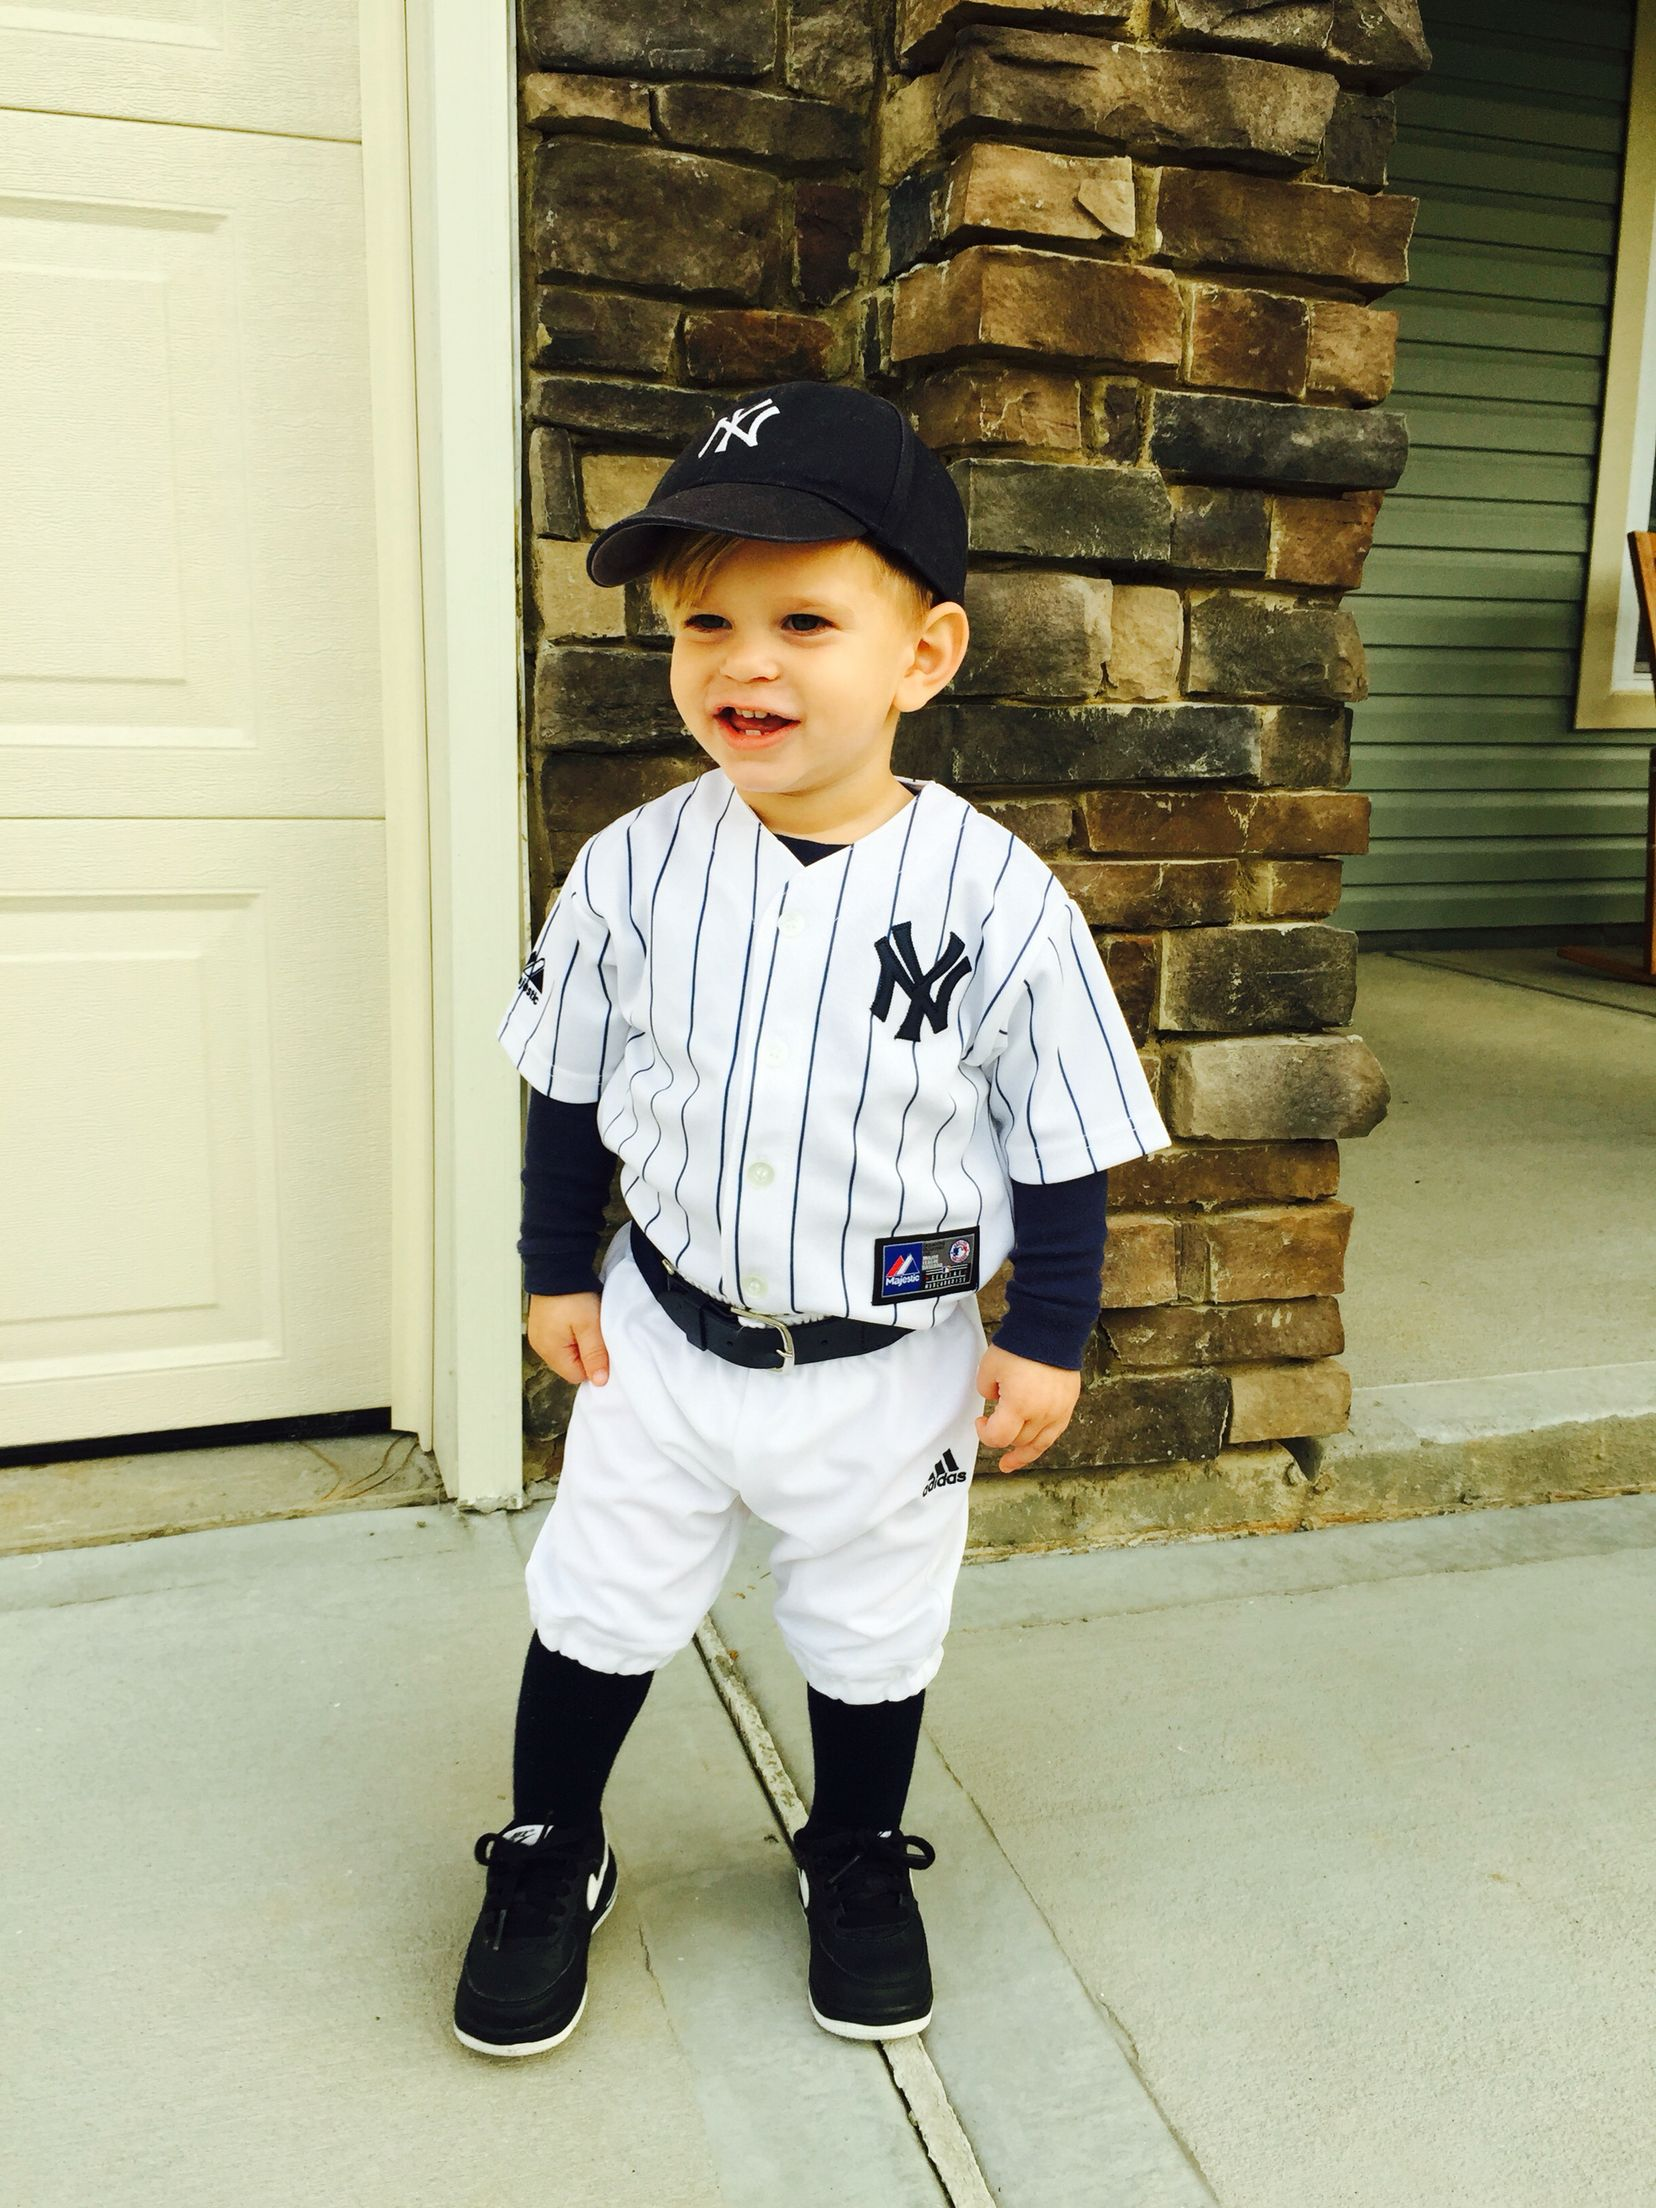 Cole David 2014 Halloween costume toddler baseball player